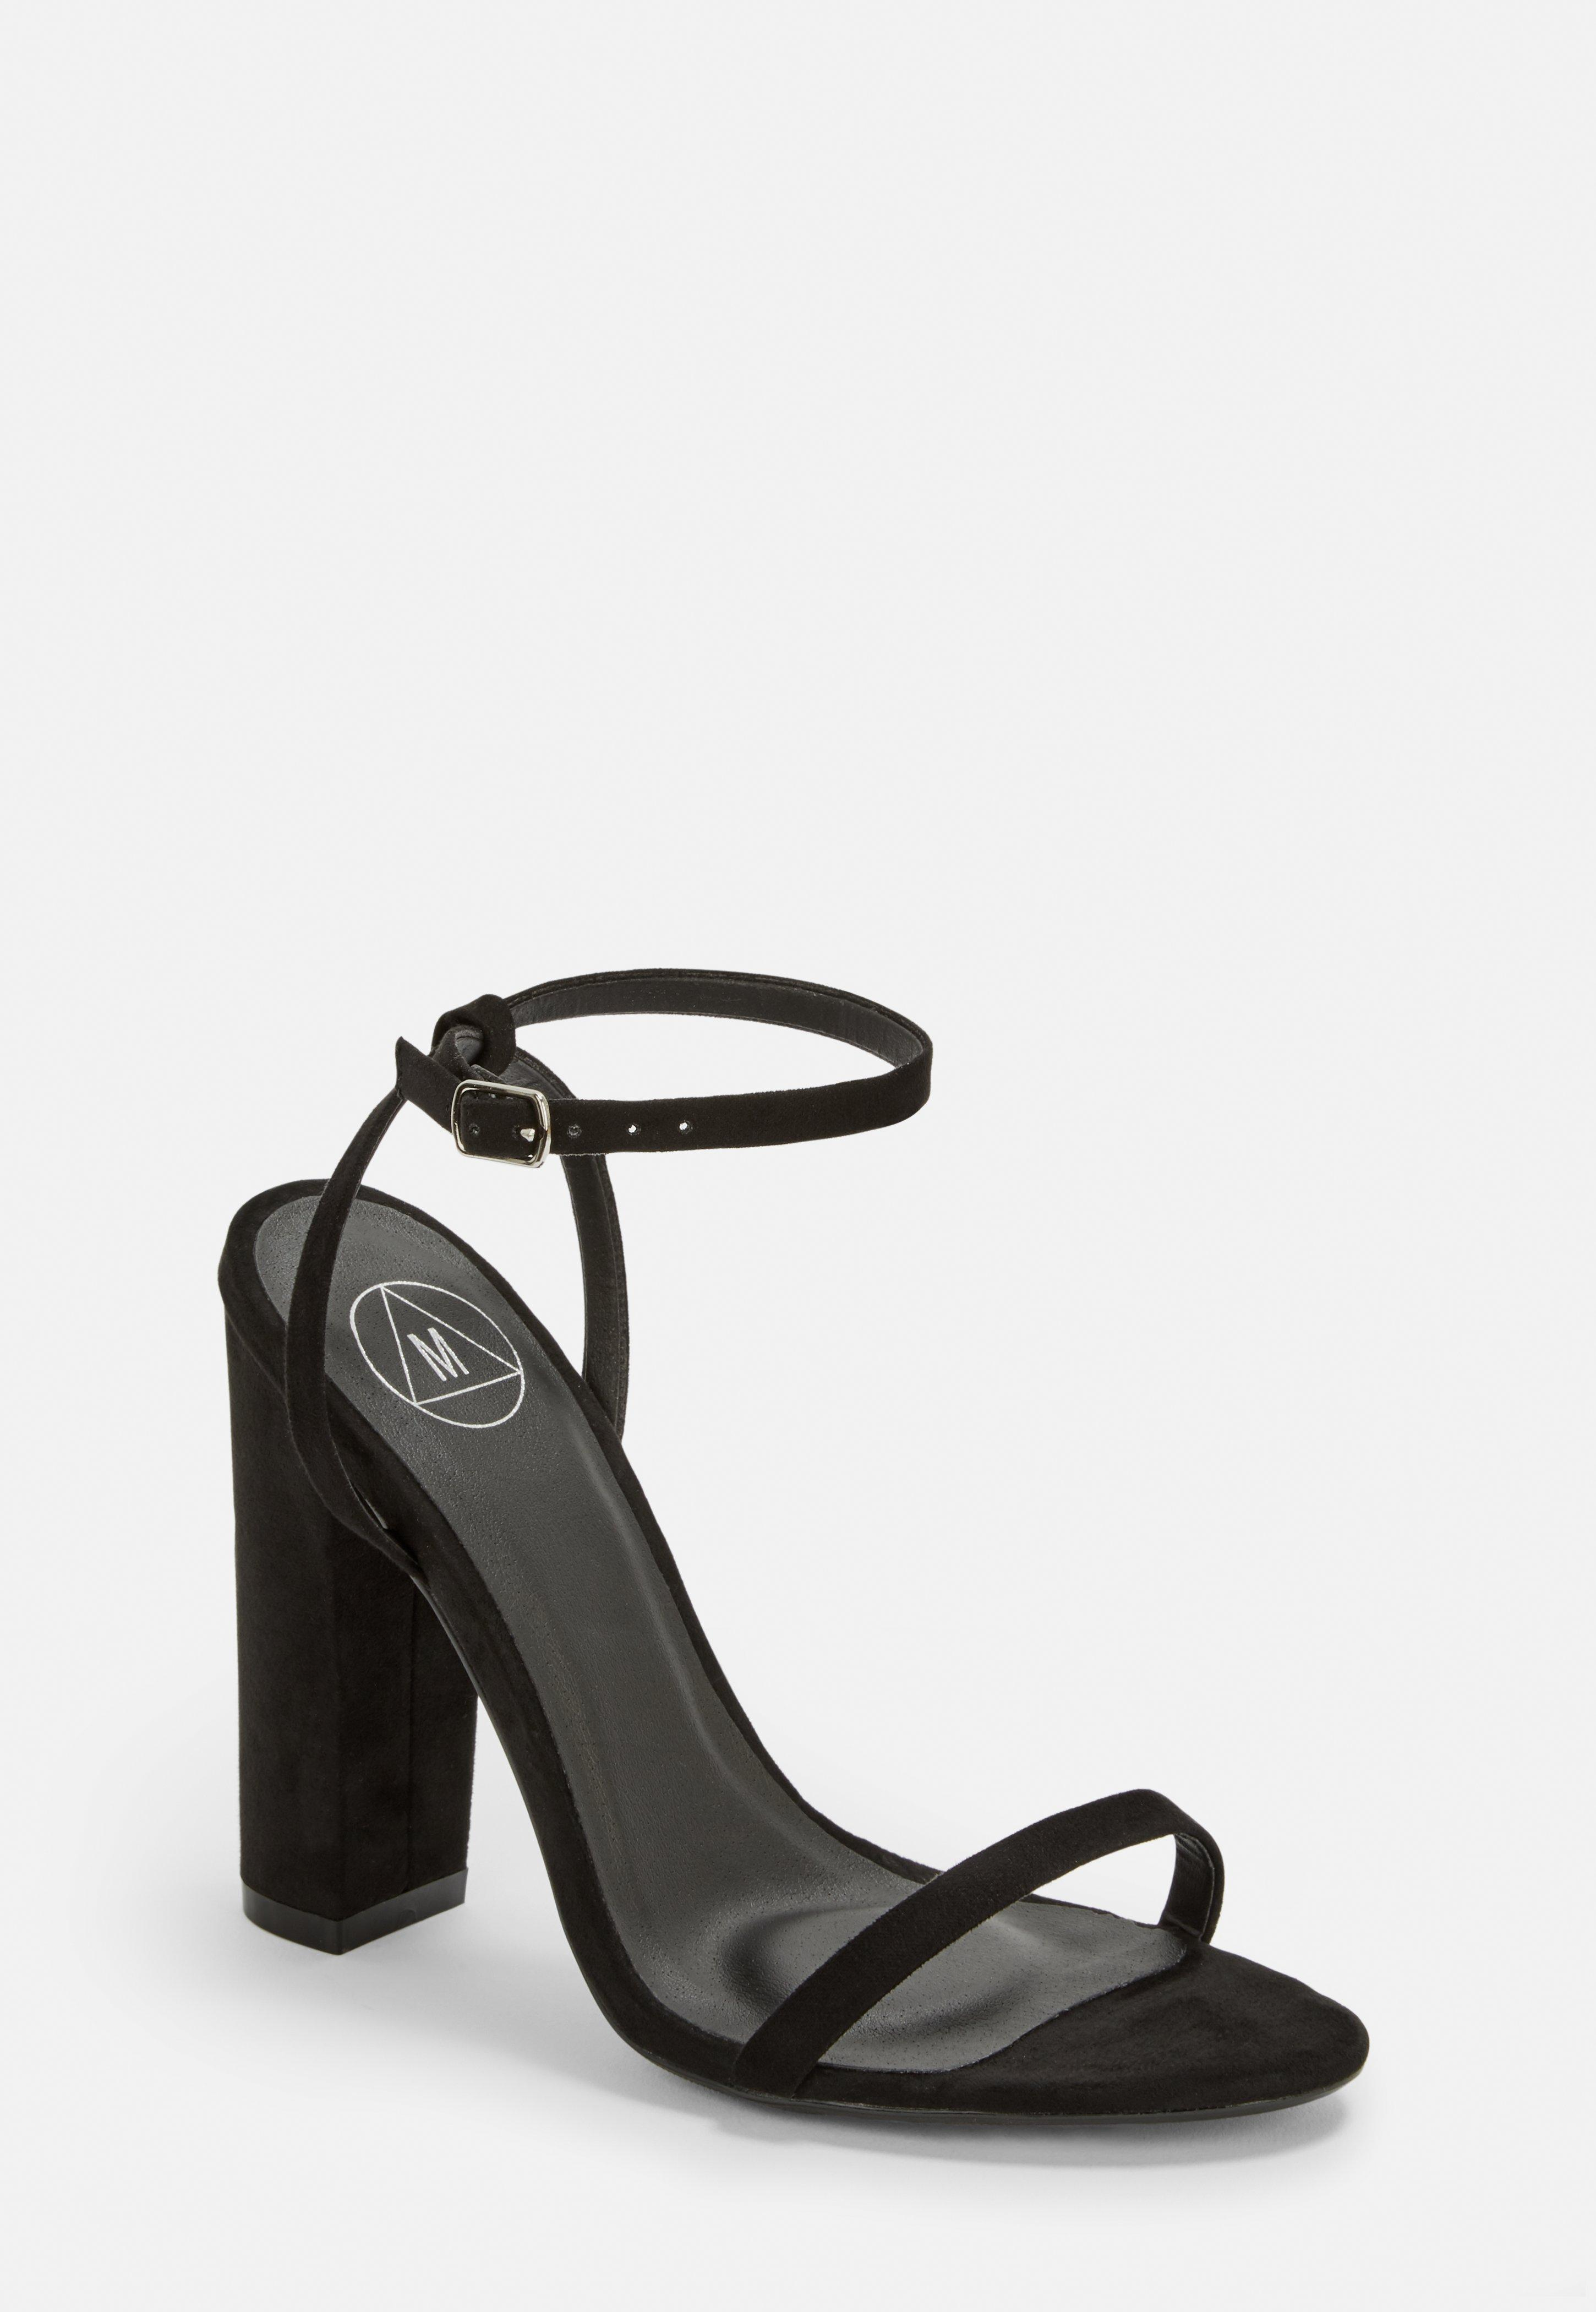 b37b421d243 Lyst - Missguided Black Faux Suede Heel Sandals in Black